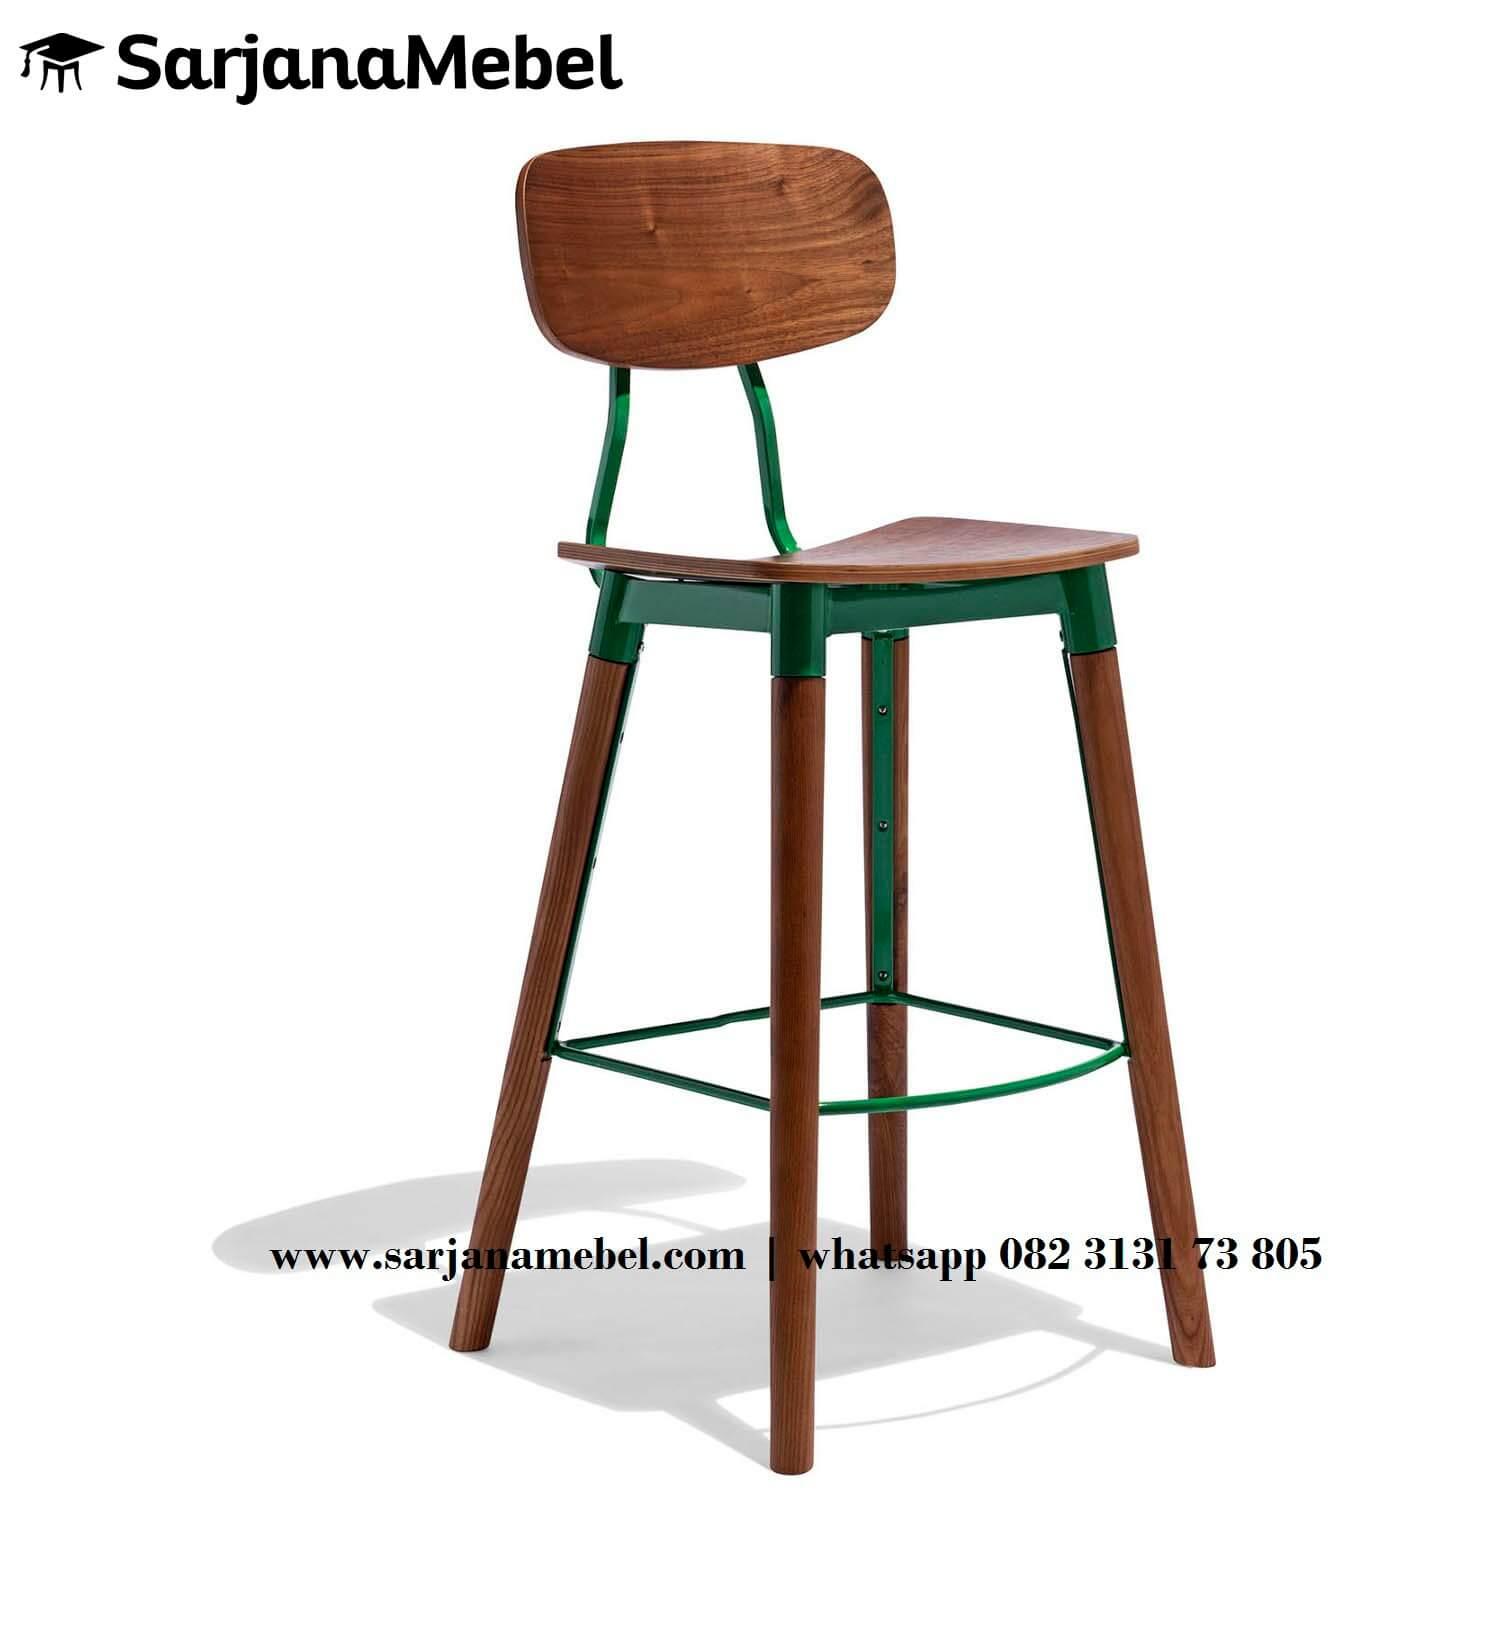 Gambar Kursi Bar Industrial Kayu Jati Rangka Besi